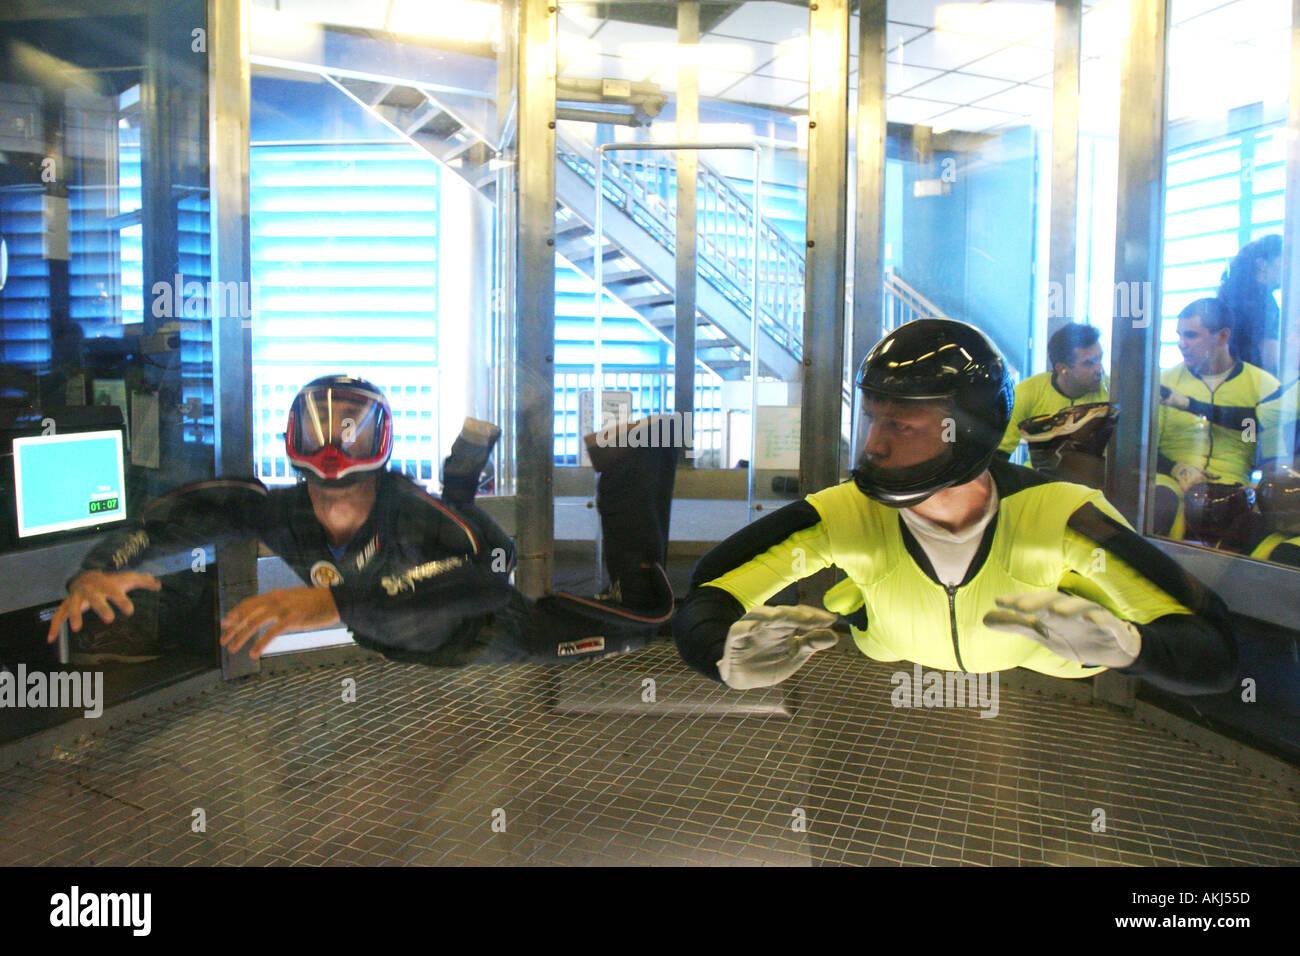 skyventure sky diving wind tunnel in orlando florida - Stock Image